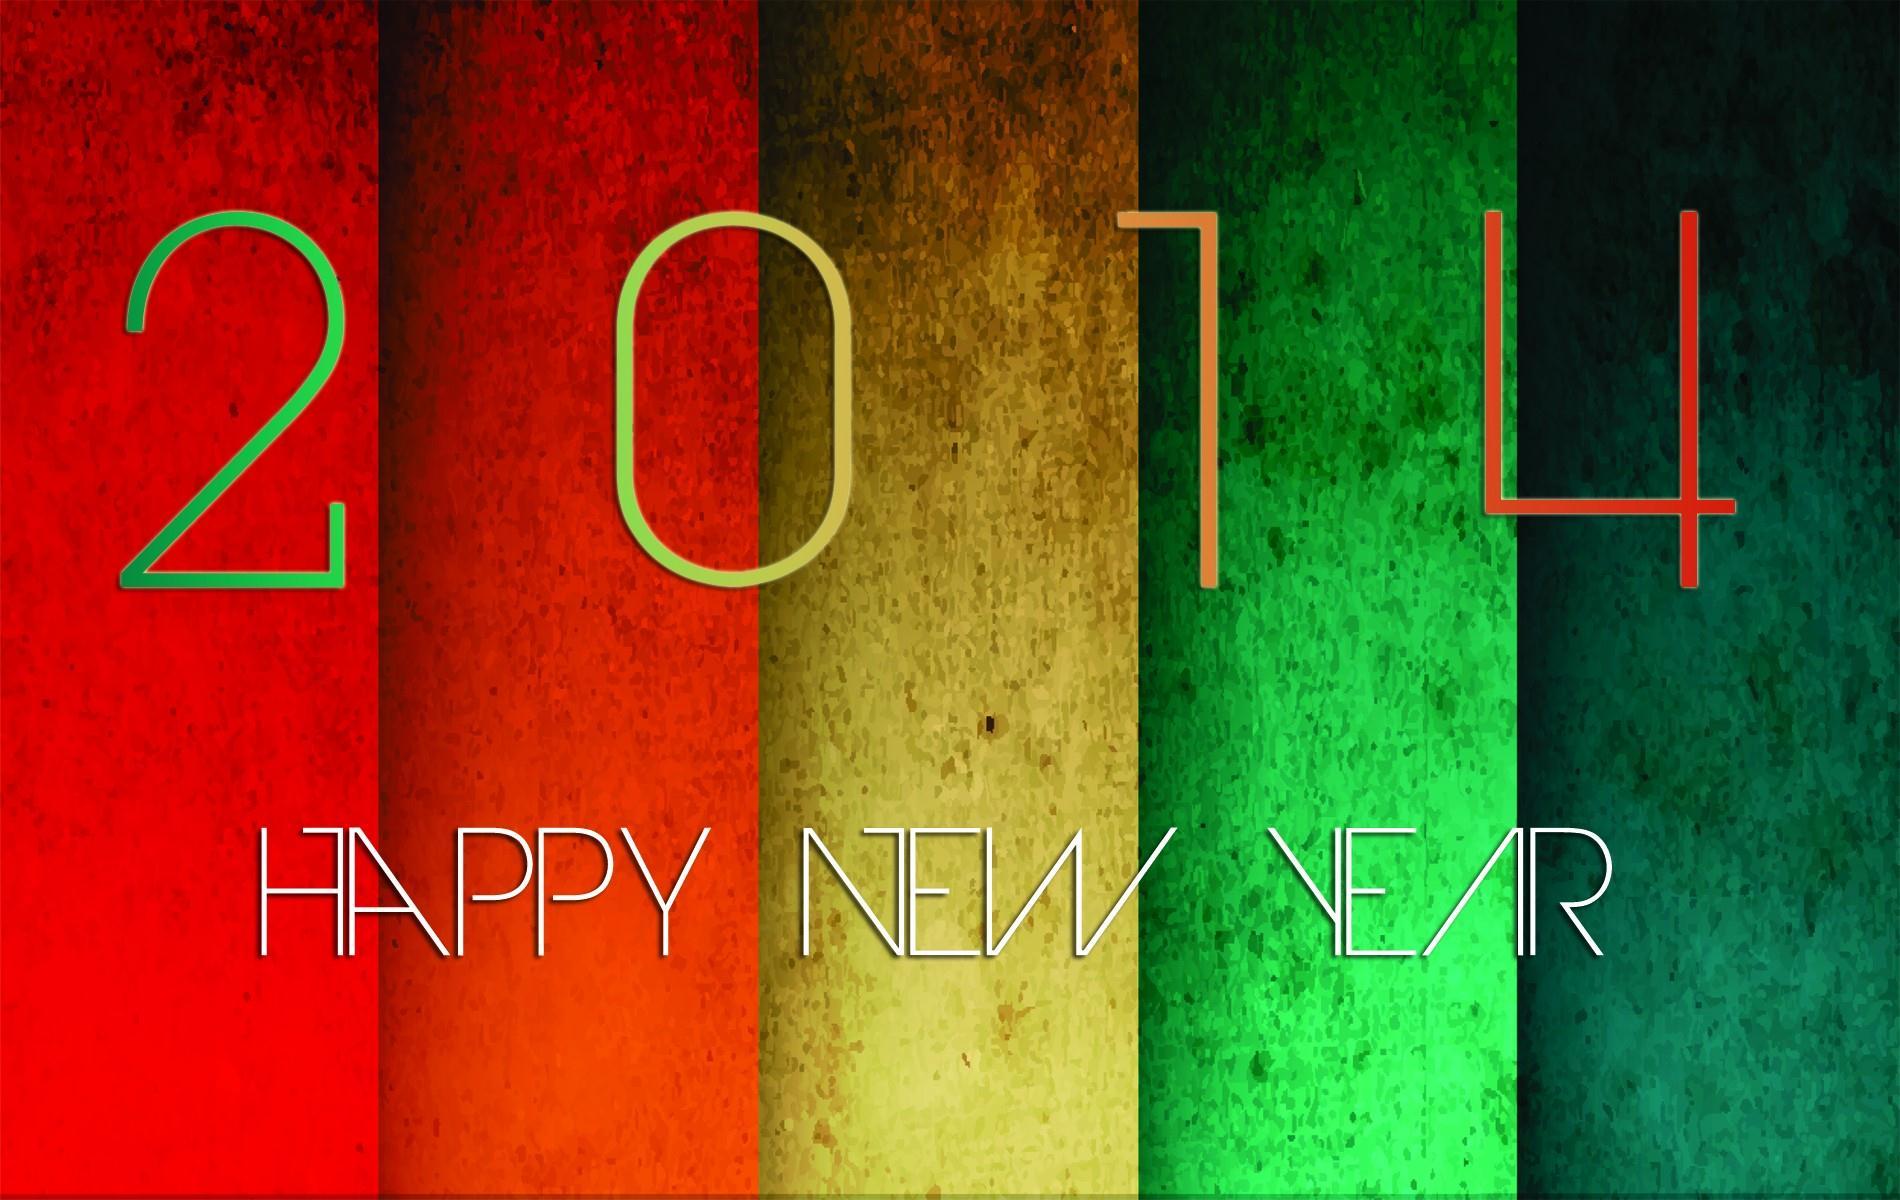 Happy New Year 2014 Wallpaper Download HD 6976463 1900x1200